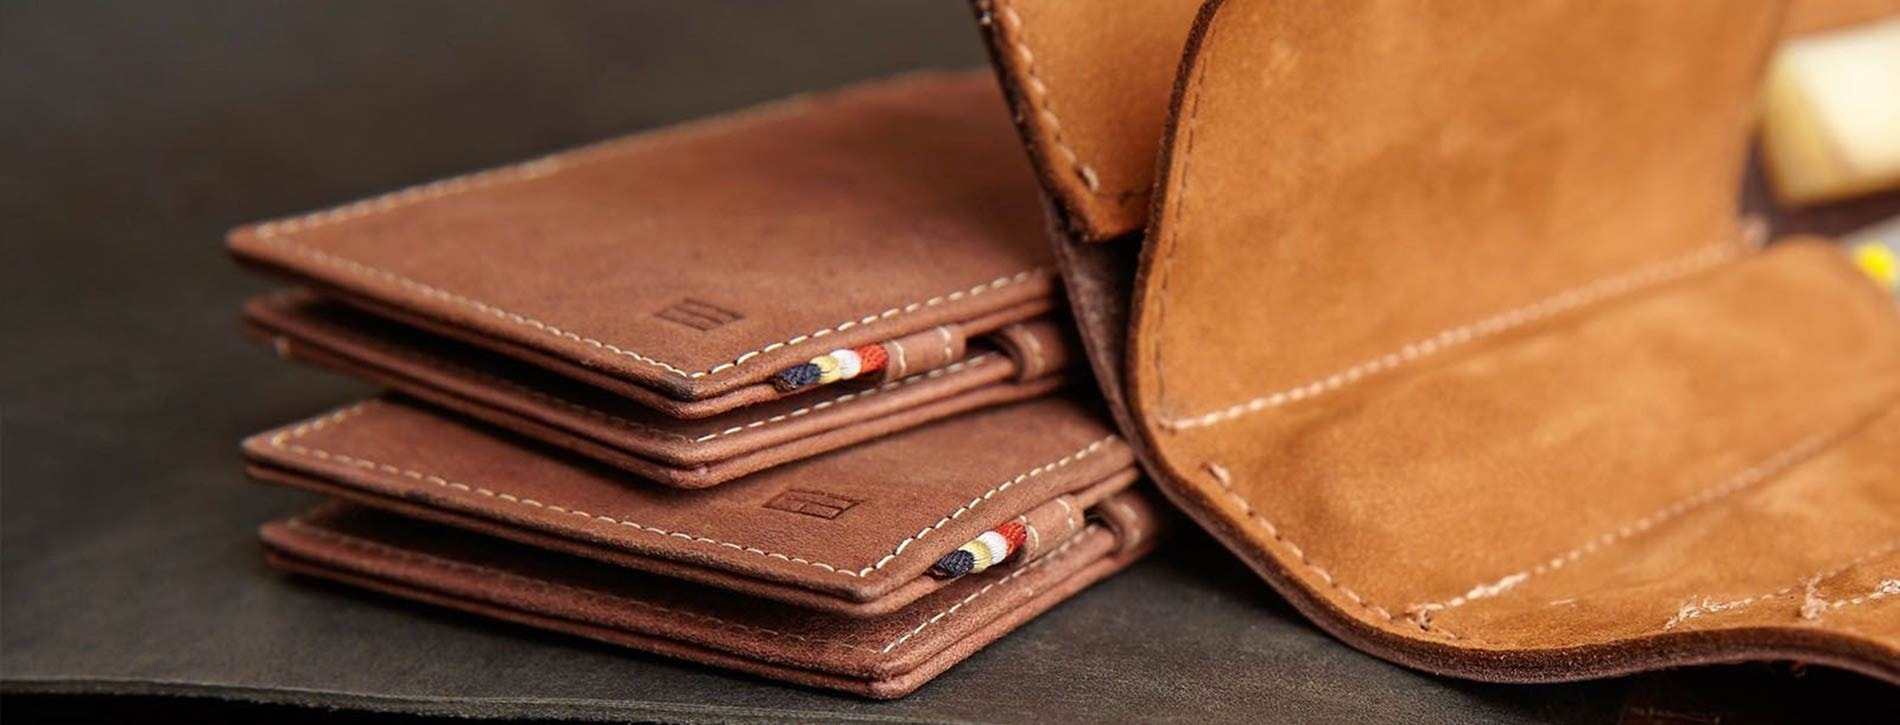 Garzini plånböcker